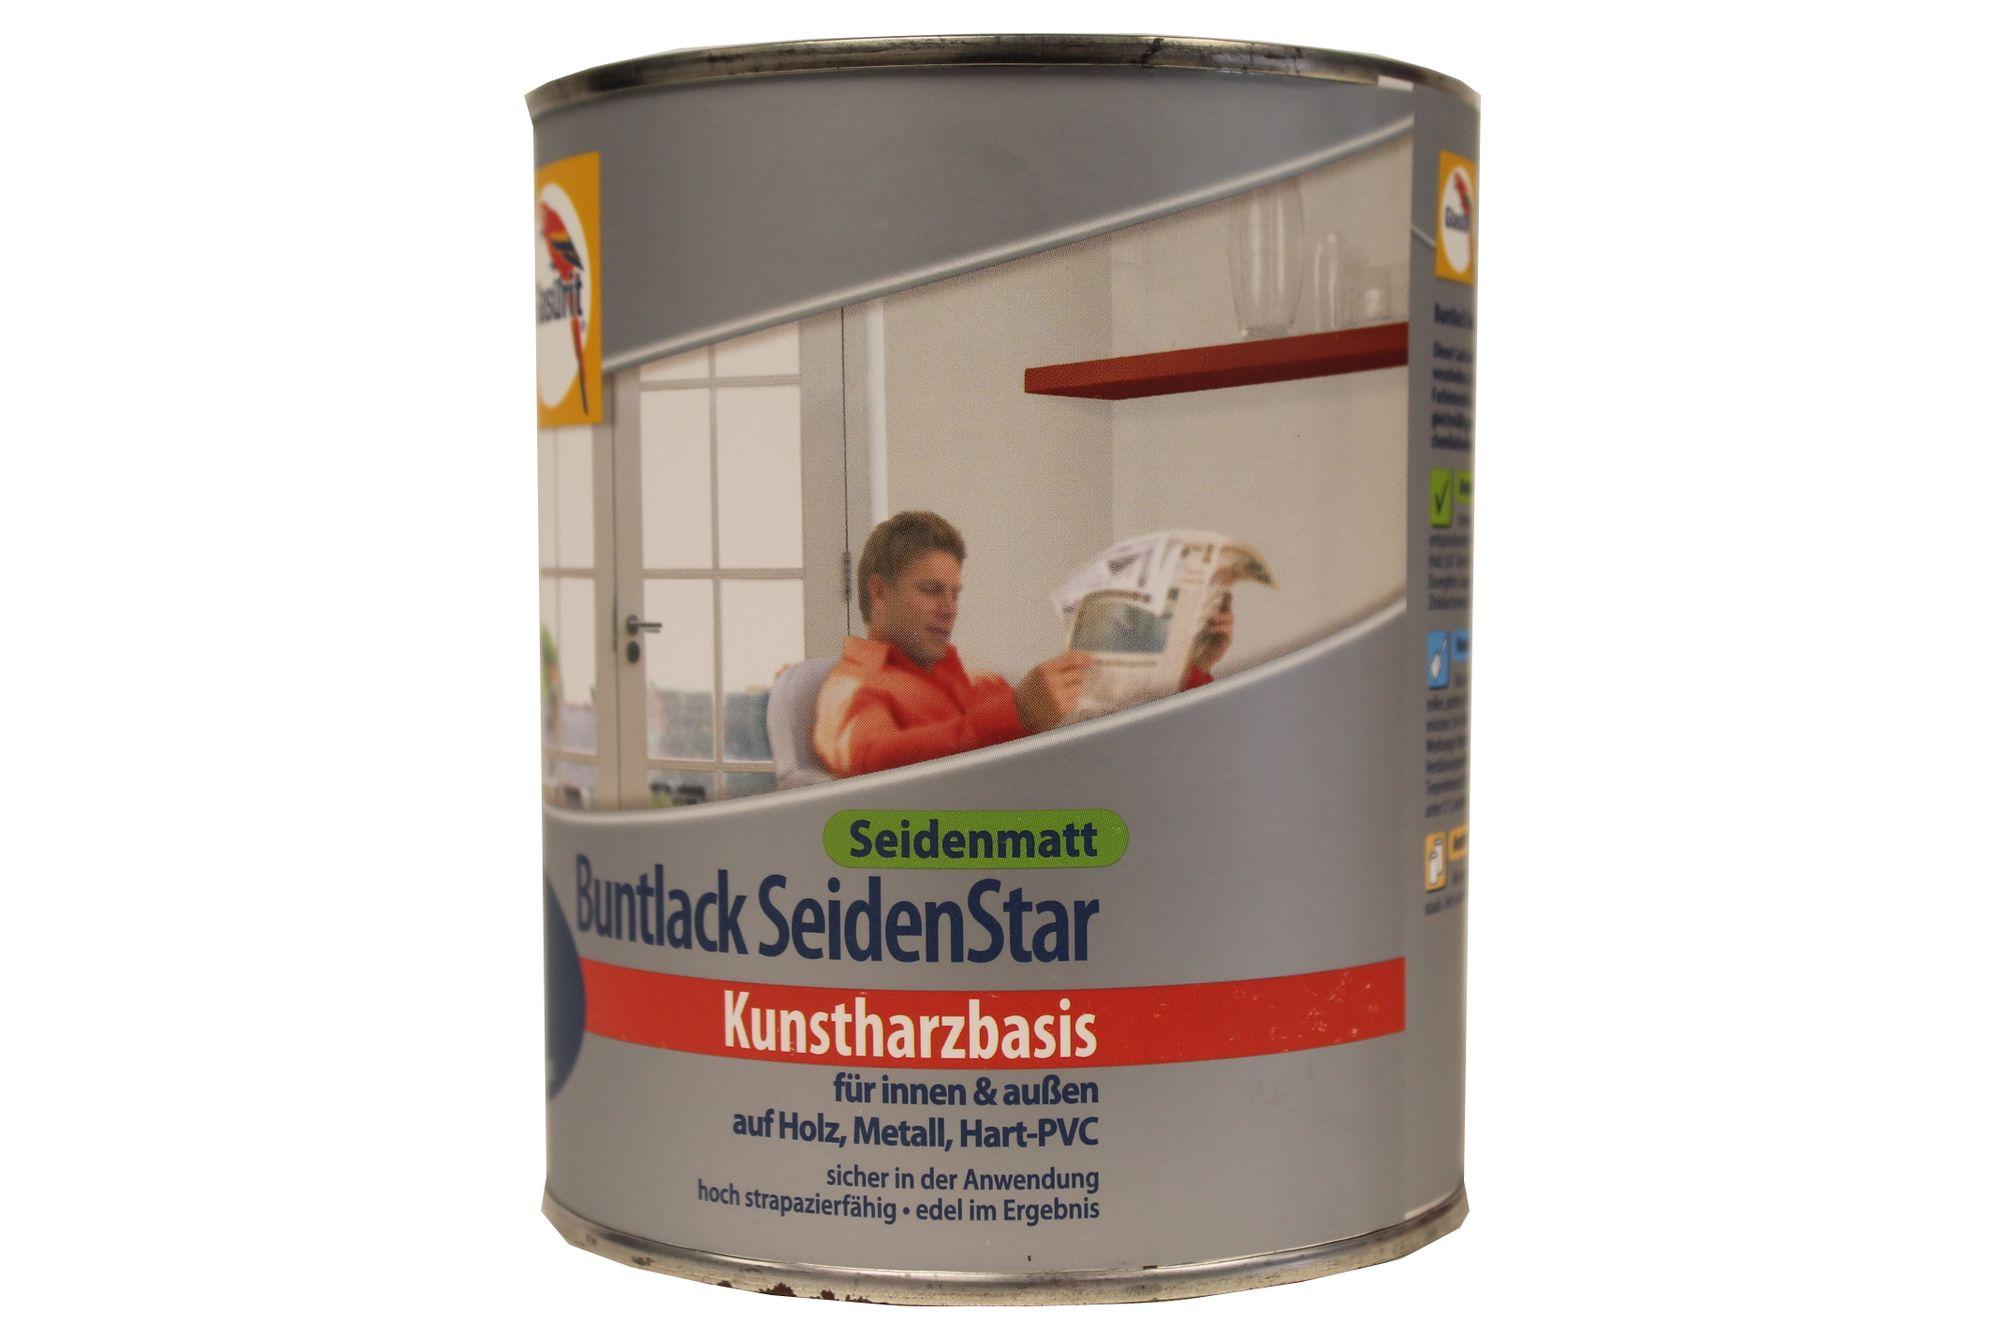 Glasurit Buntlack SeidenStar Seidenmatt Kunstharzbasis 750 ml Farbwahl